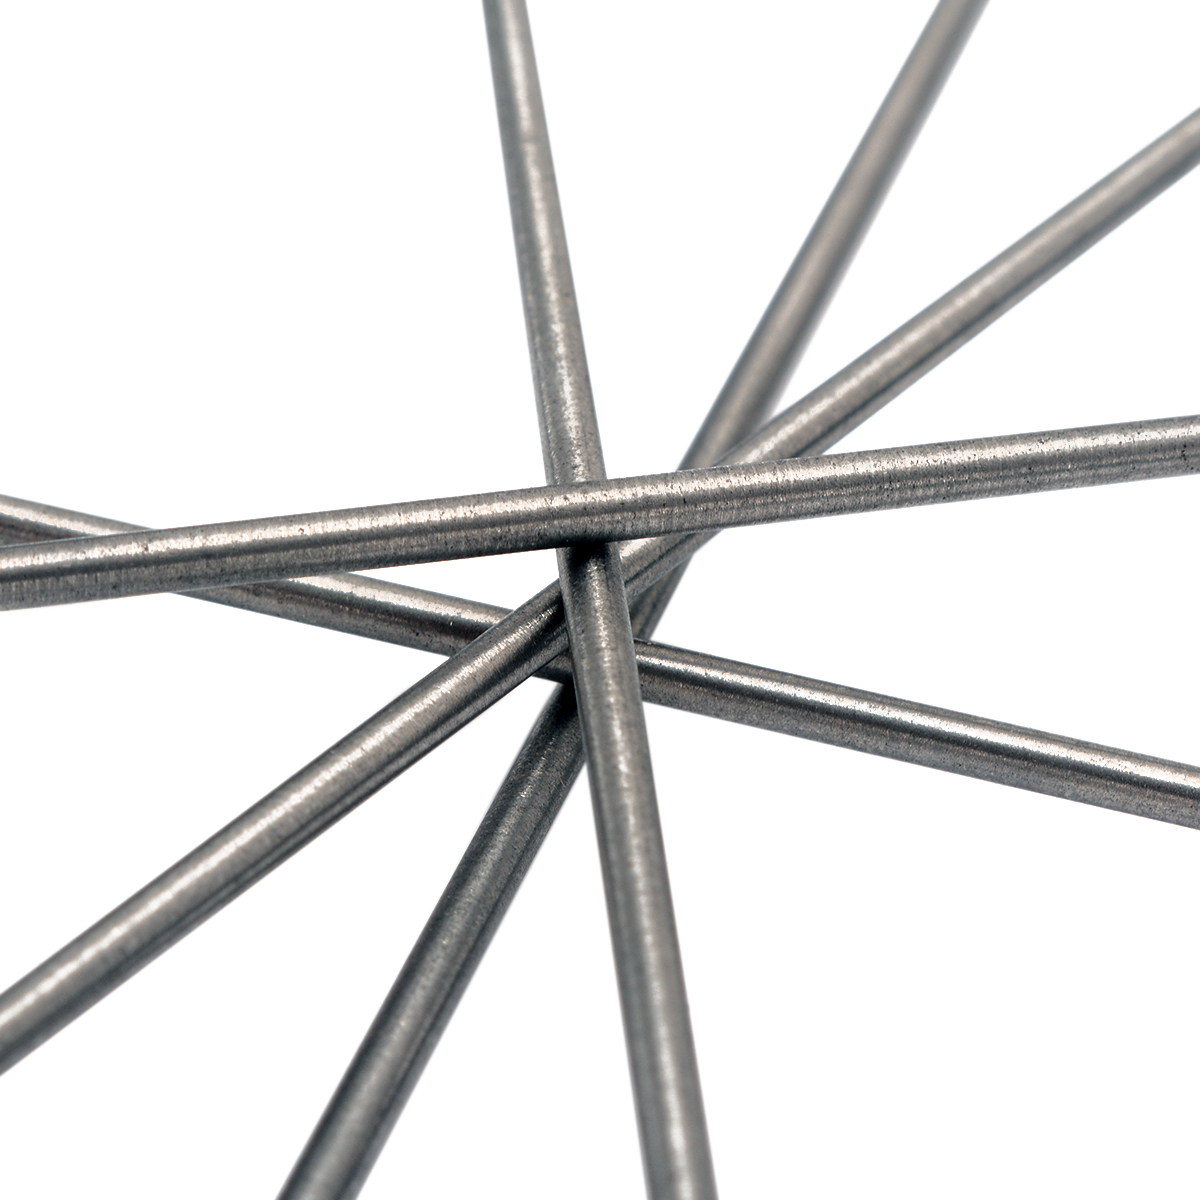 5pcs 4x250mm Titanium Ti Grade 5 Gr.5 GR5 Metal Rod Diameter 4mm Length 250mm